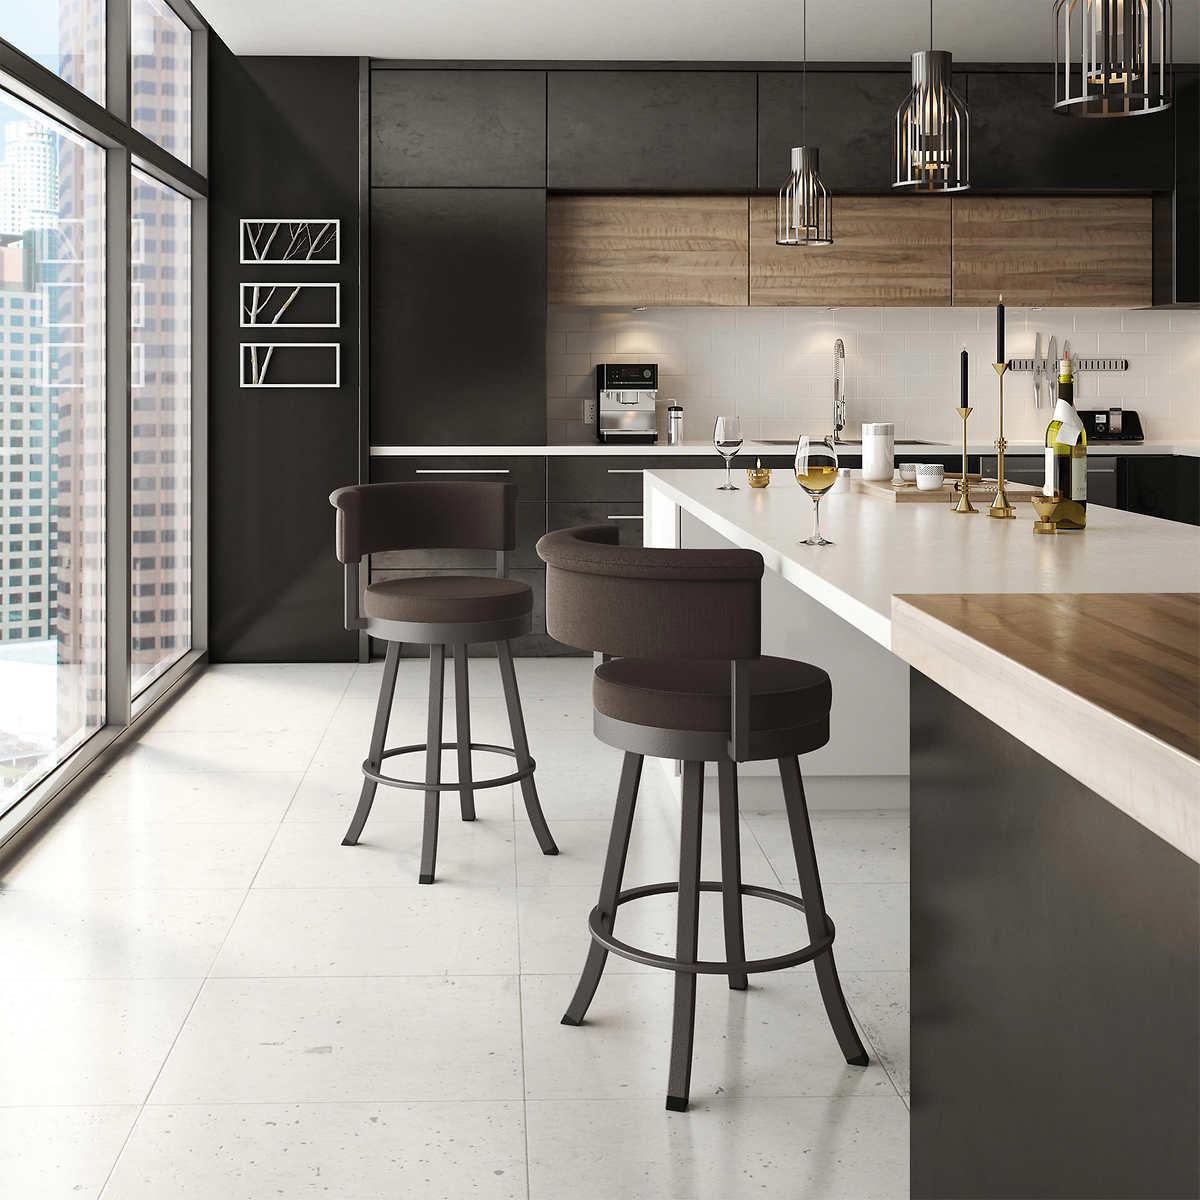 Cheyenne home furnishings bar stool - Americo 26 Swivel Barstool Variegated Gray